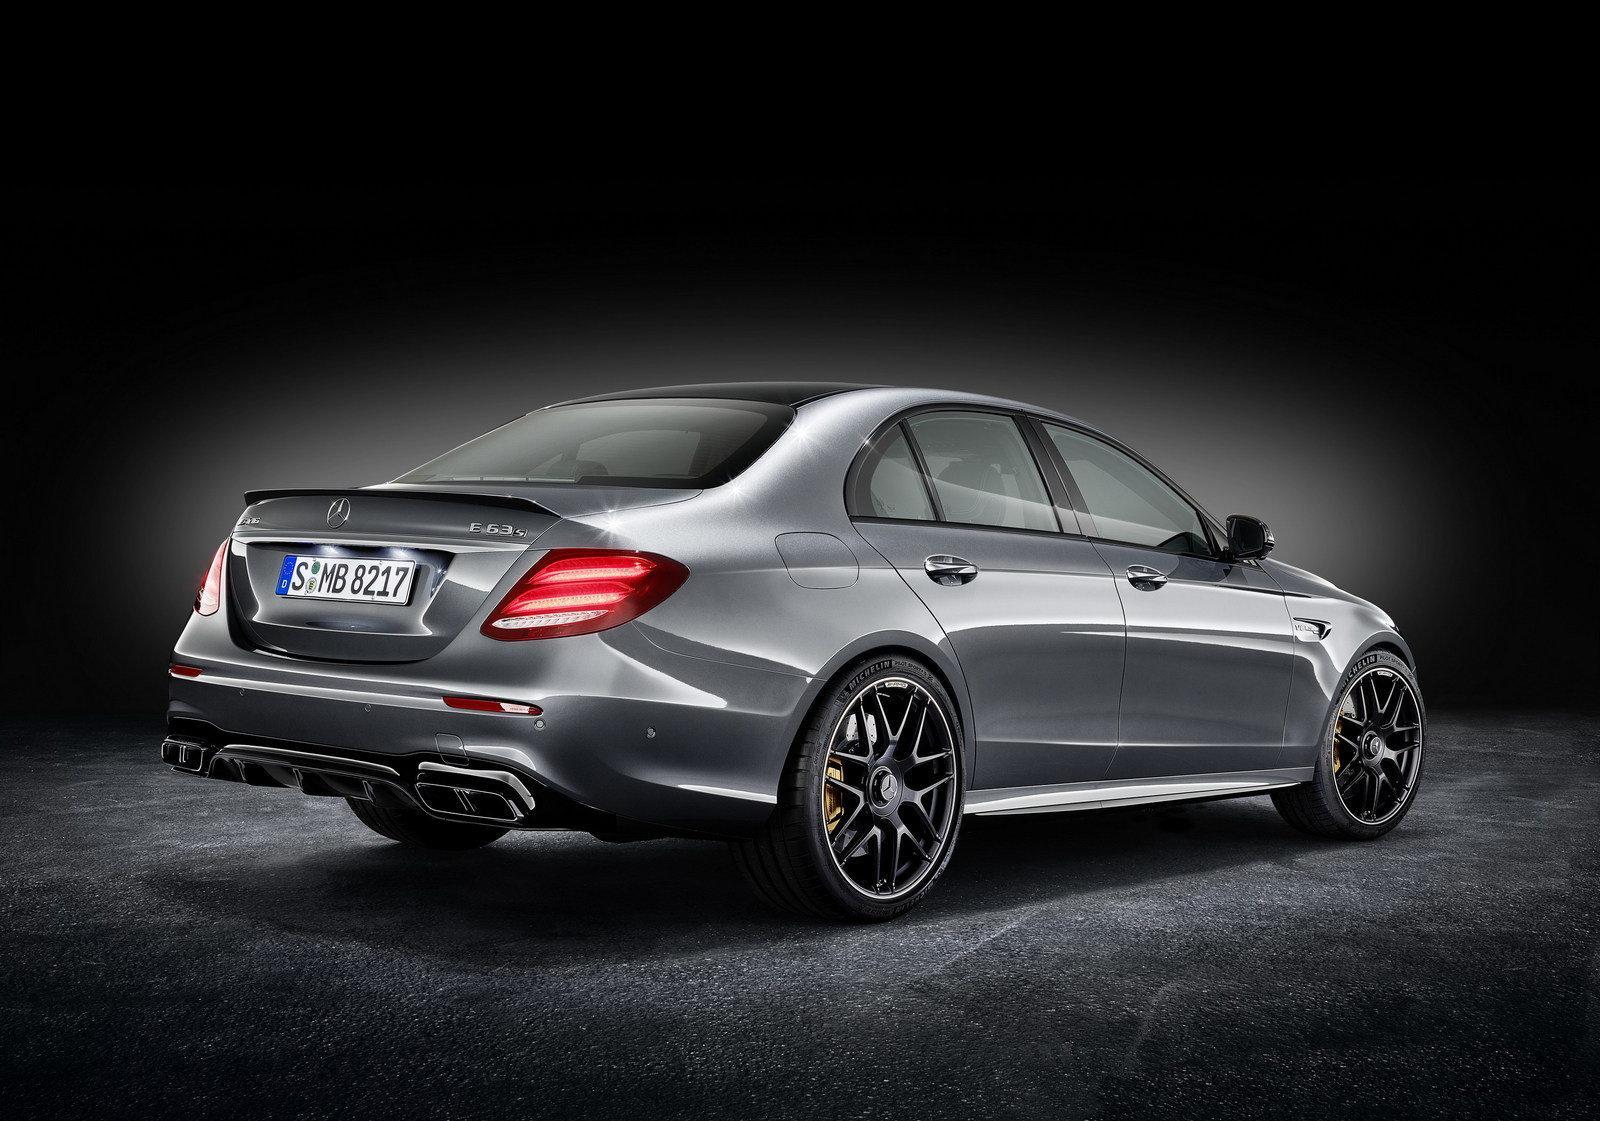 Mercedes-Benz E 63 AMG S 4Matic+ W213 laptimes, specs, performance